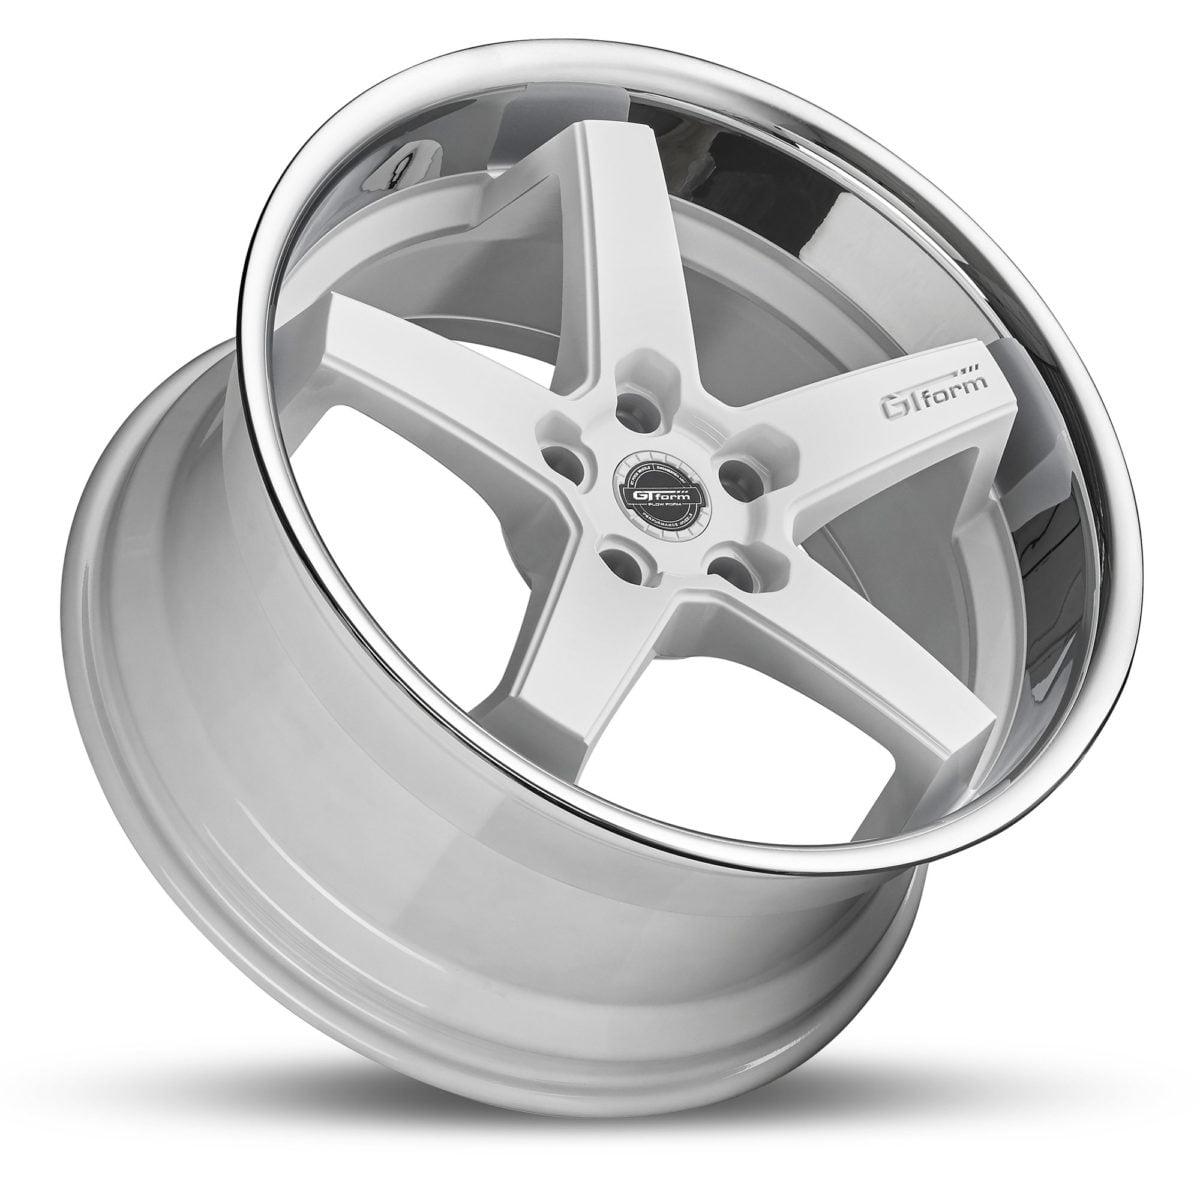 GT Form Legacy gloss white chrome lip wheels car rims performance wheels